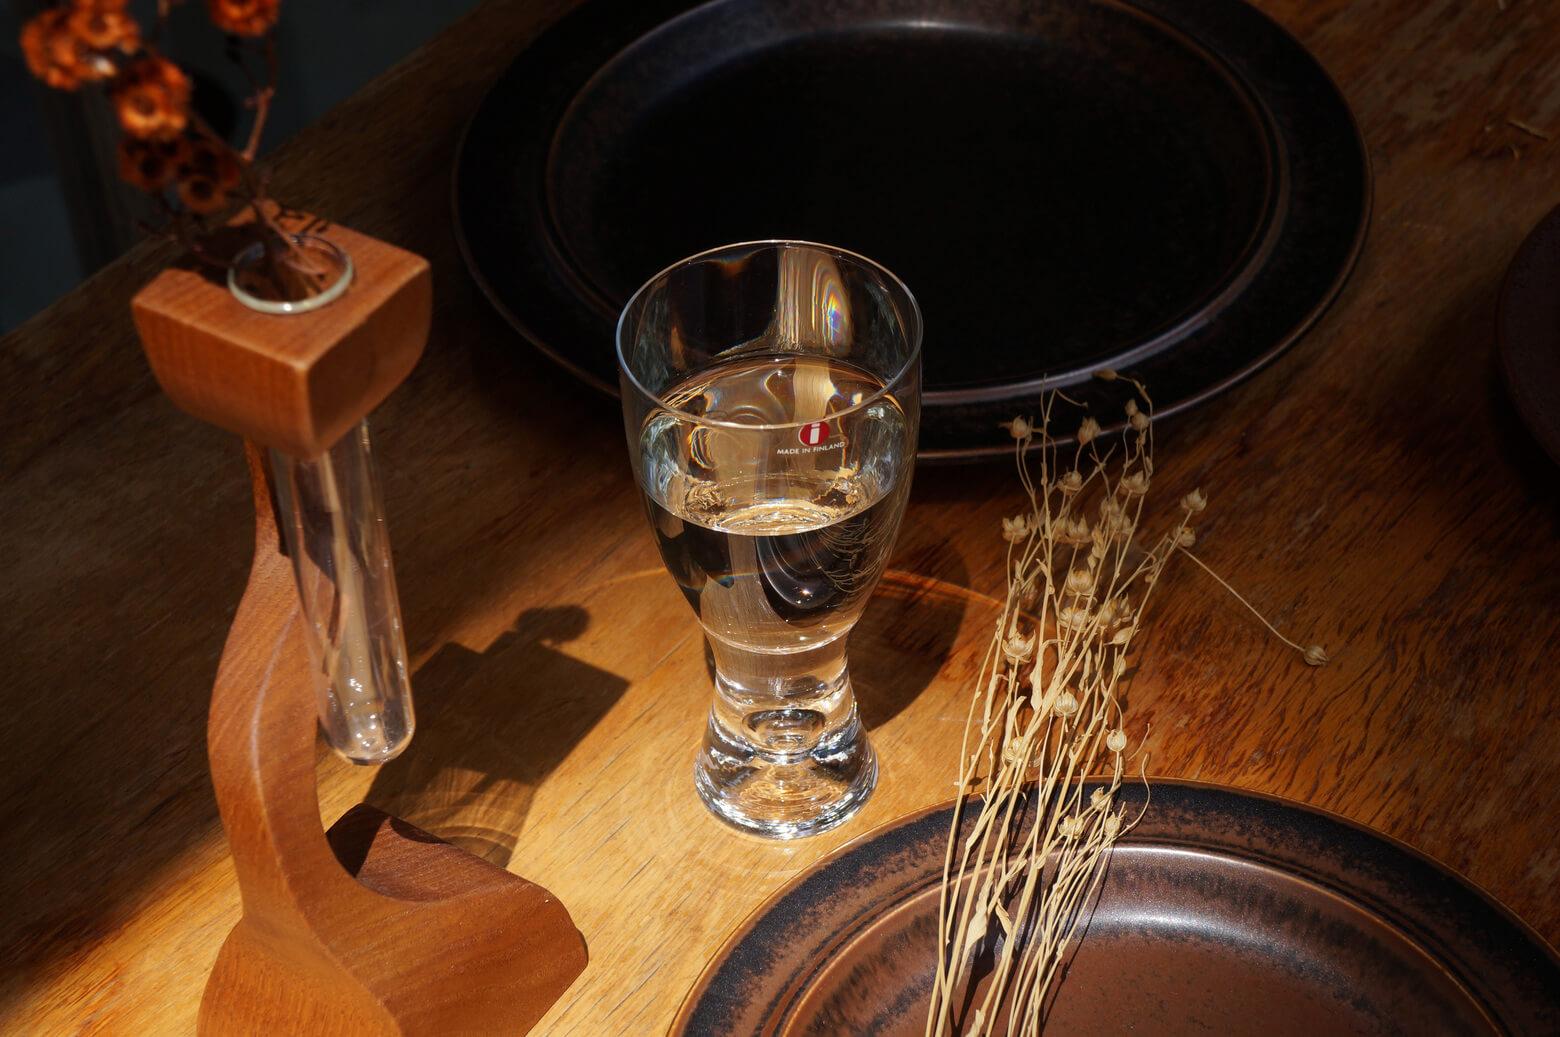 iittala Tapio Wirkkala Glass/イッタラ タピオ・ウィルカラ ホワイト ワイン グラス 北欧食器 フィンランド